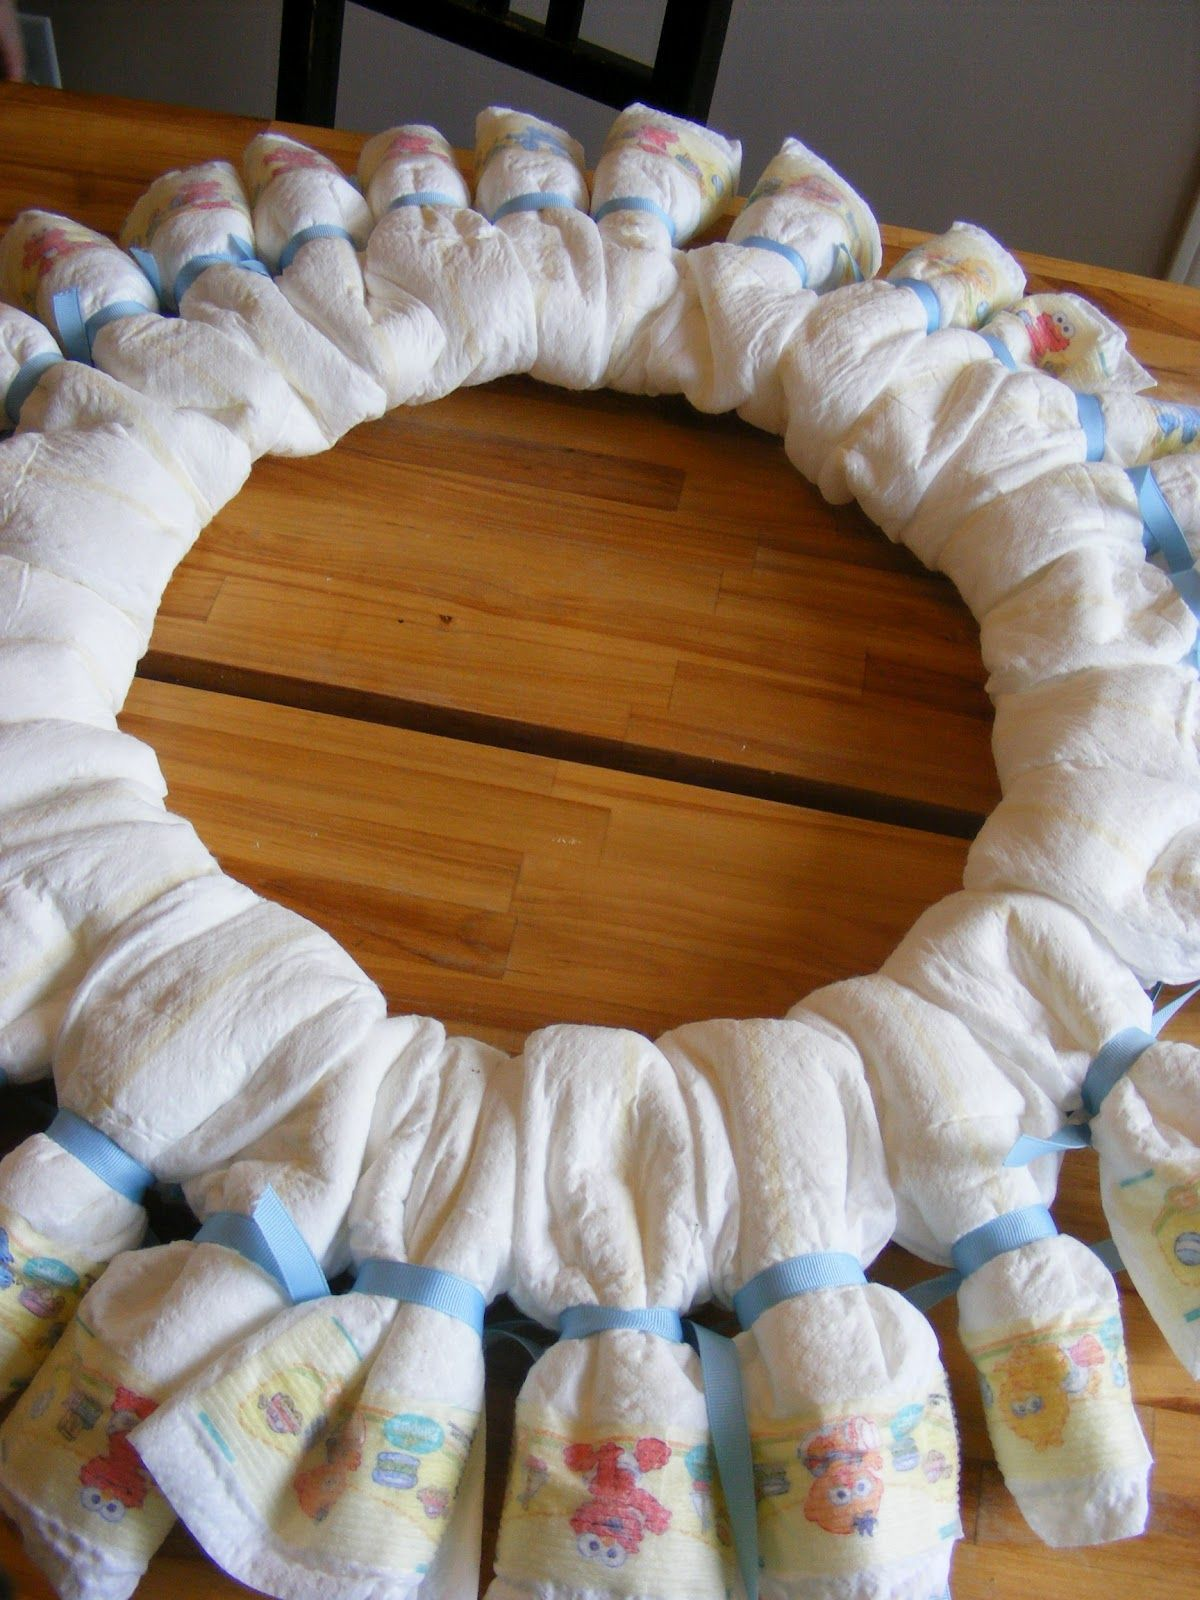 1.bp.blogspot.com -gwAM_A_a-dA T8zLhU0C6dI AAAAAAAADBI OBjSsH9kNa0 s1600 diaper+wreath+back.JPG